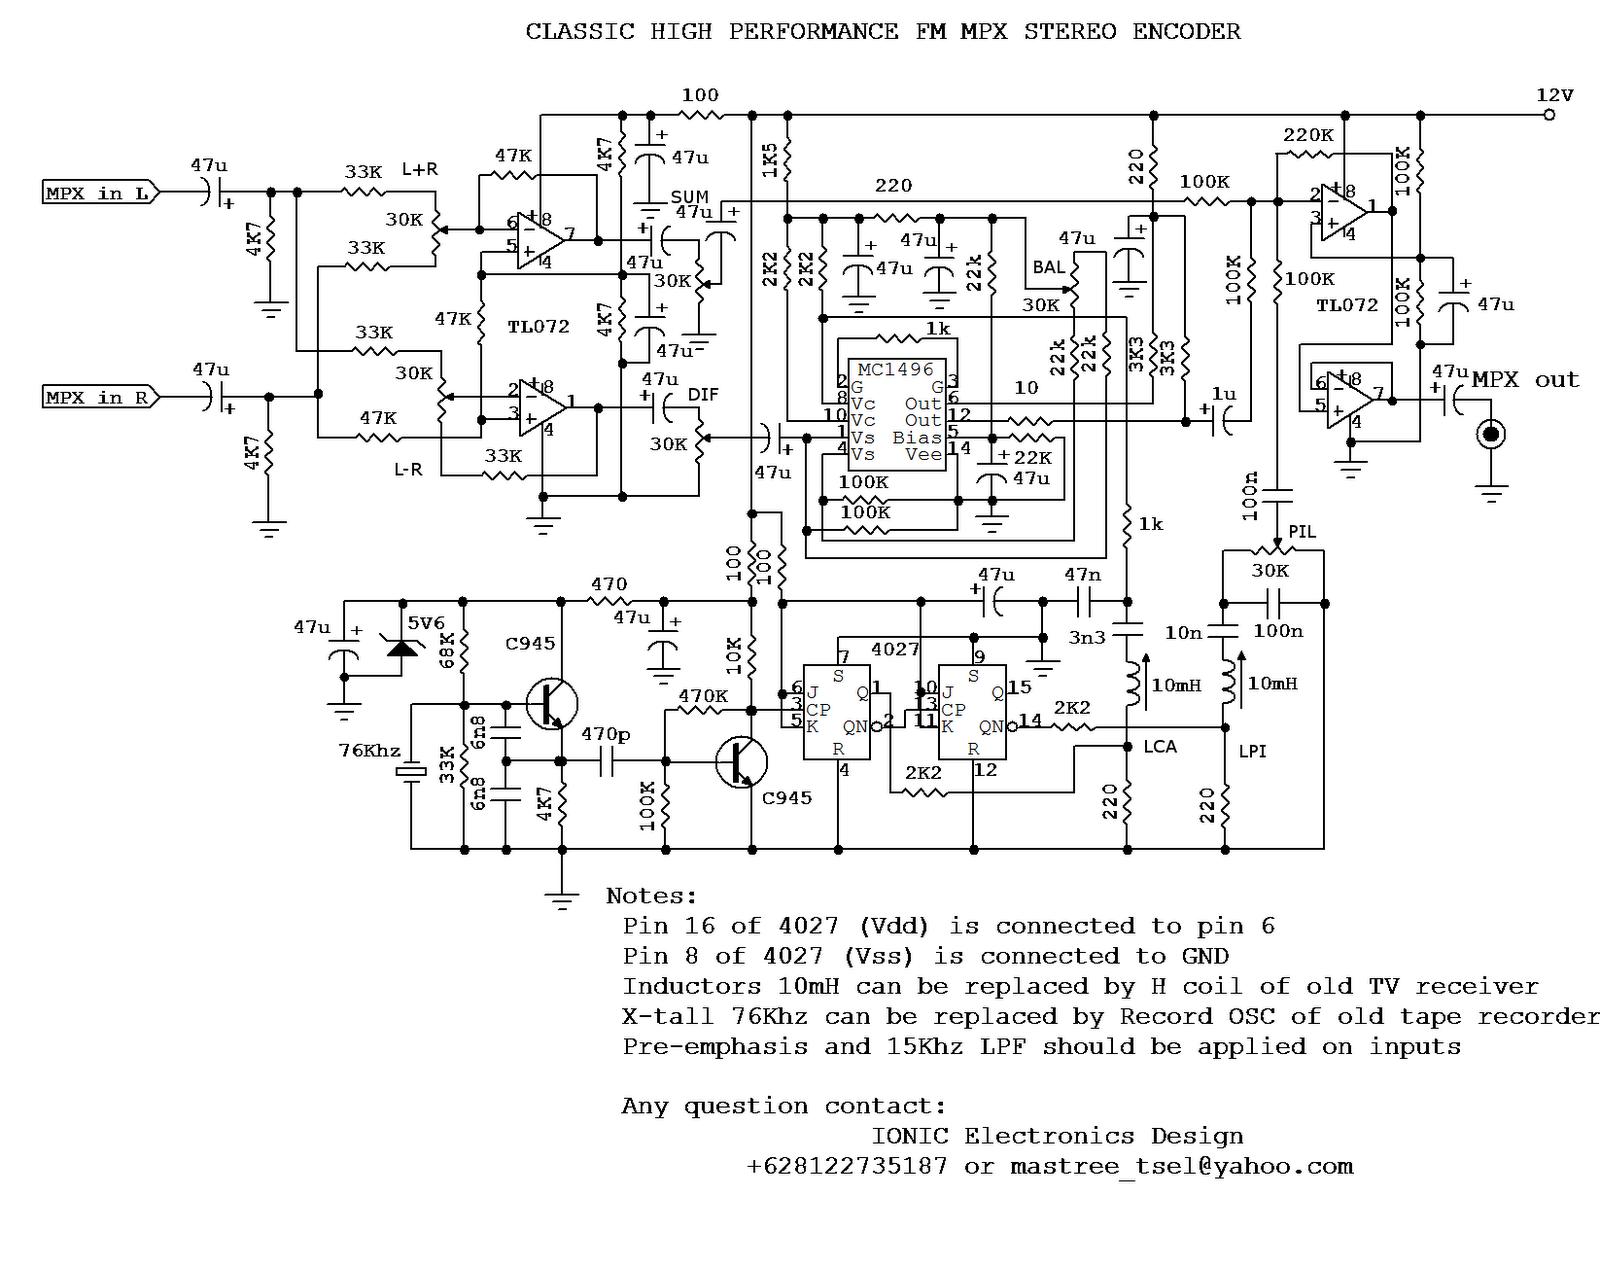 Electro Merancang Dan Membuat Sendiri Pemancar Fm Stereo